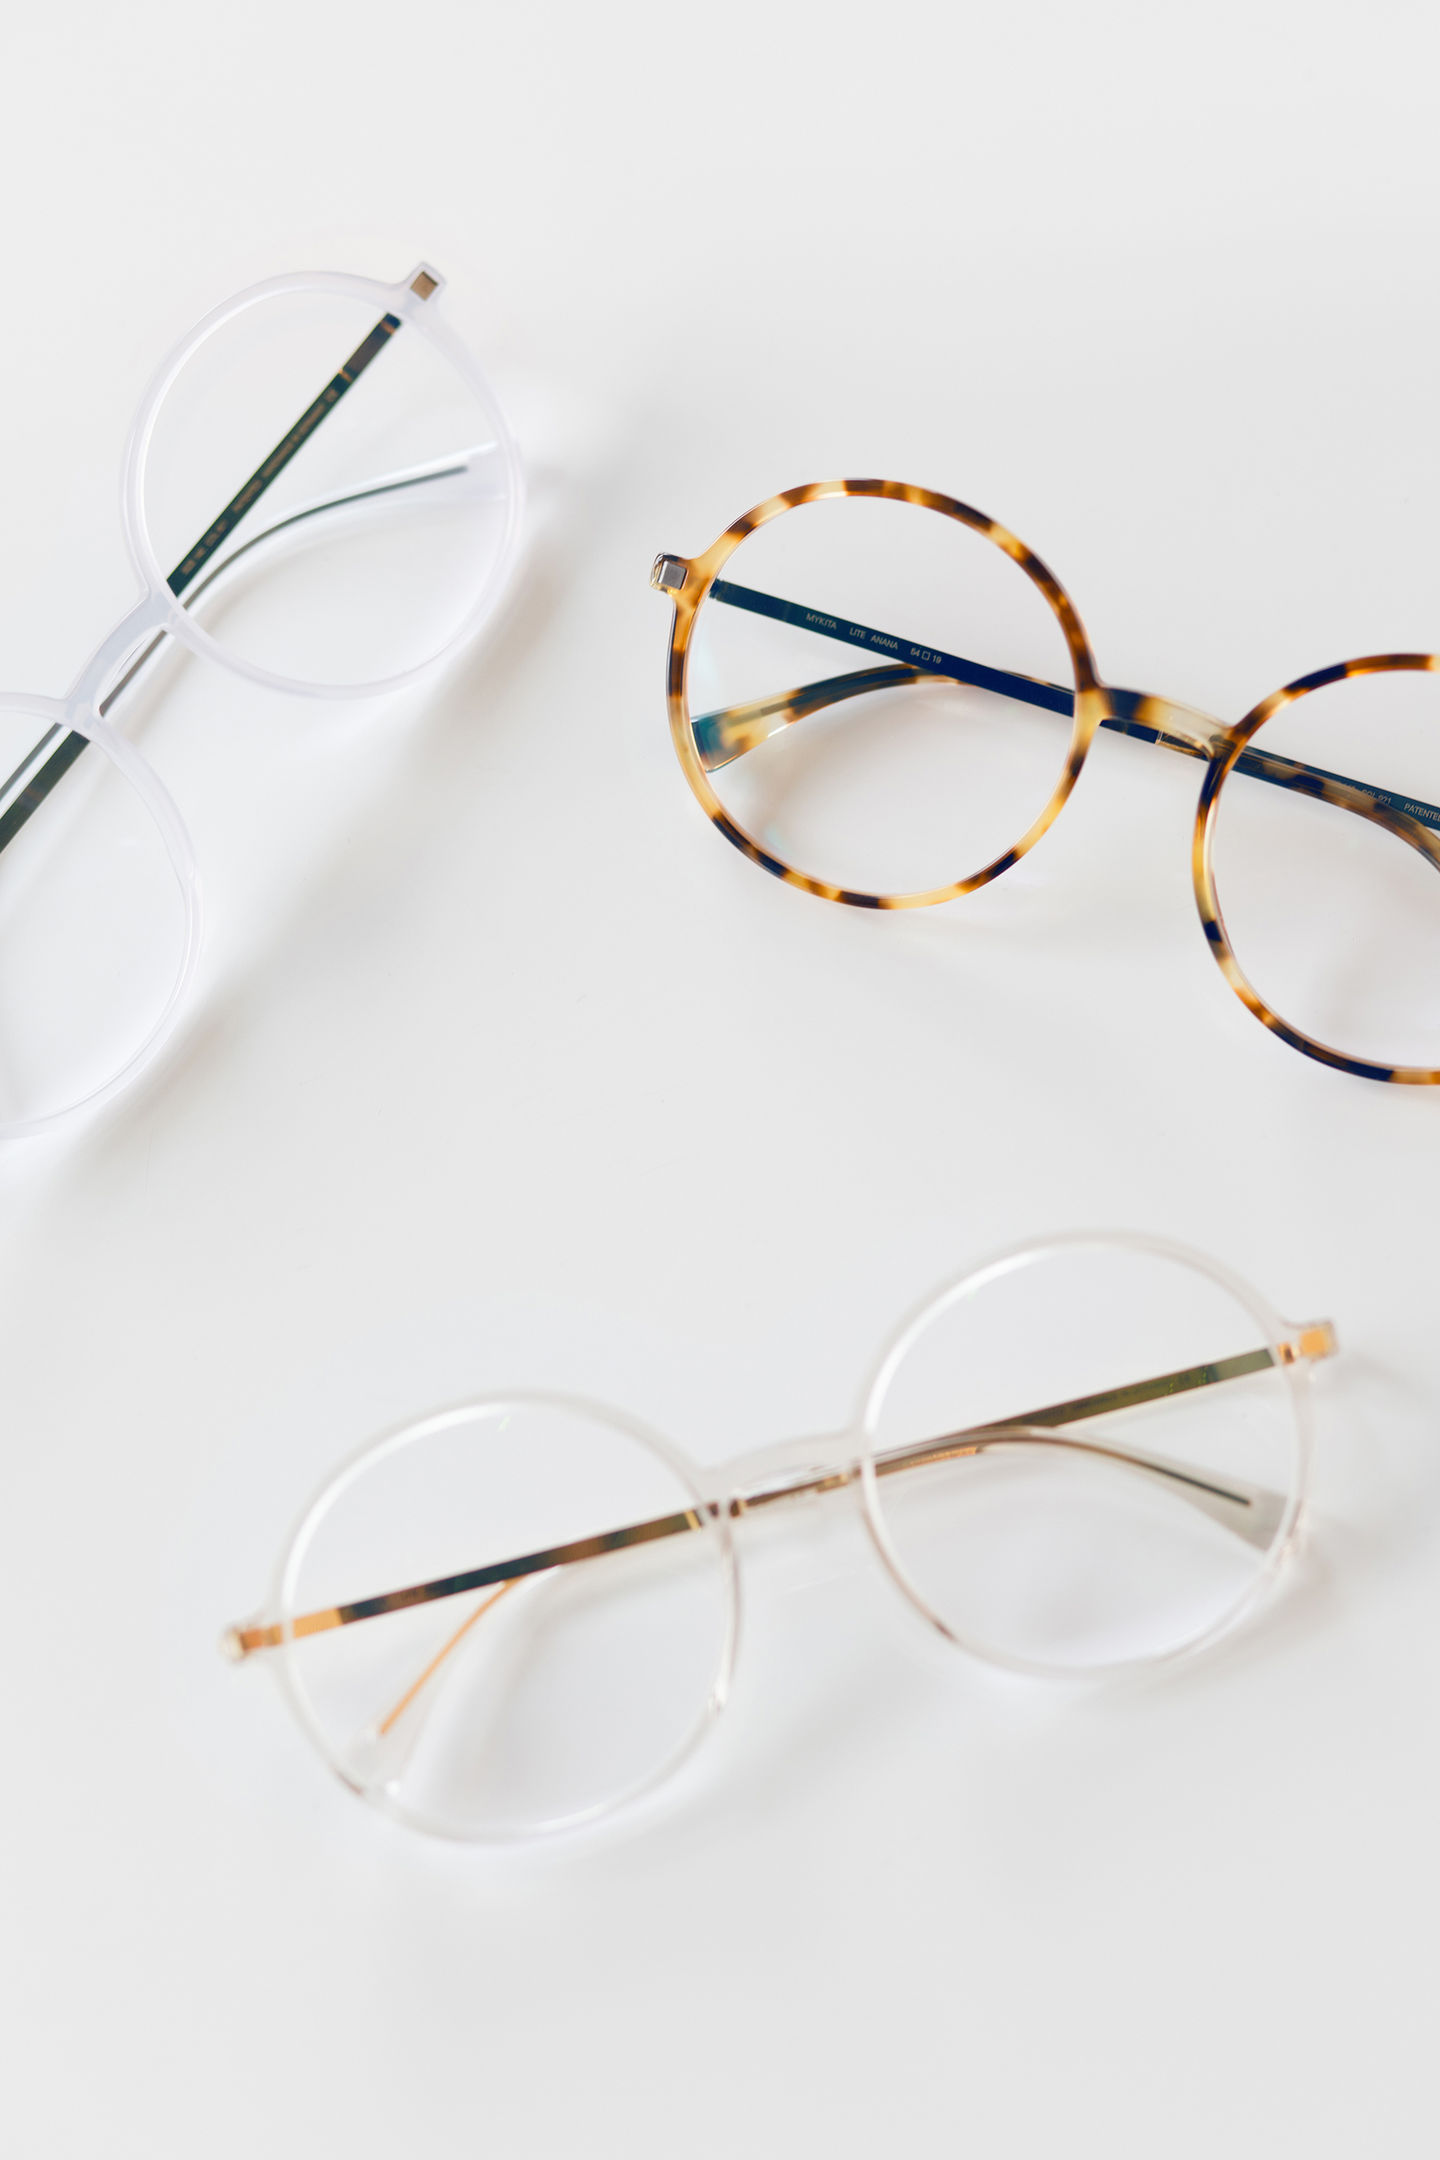 how-to-pick-the-perfect-pair-of-mykita-glasses-or-sunglasses-mykita-journal-5.jpg